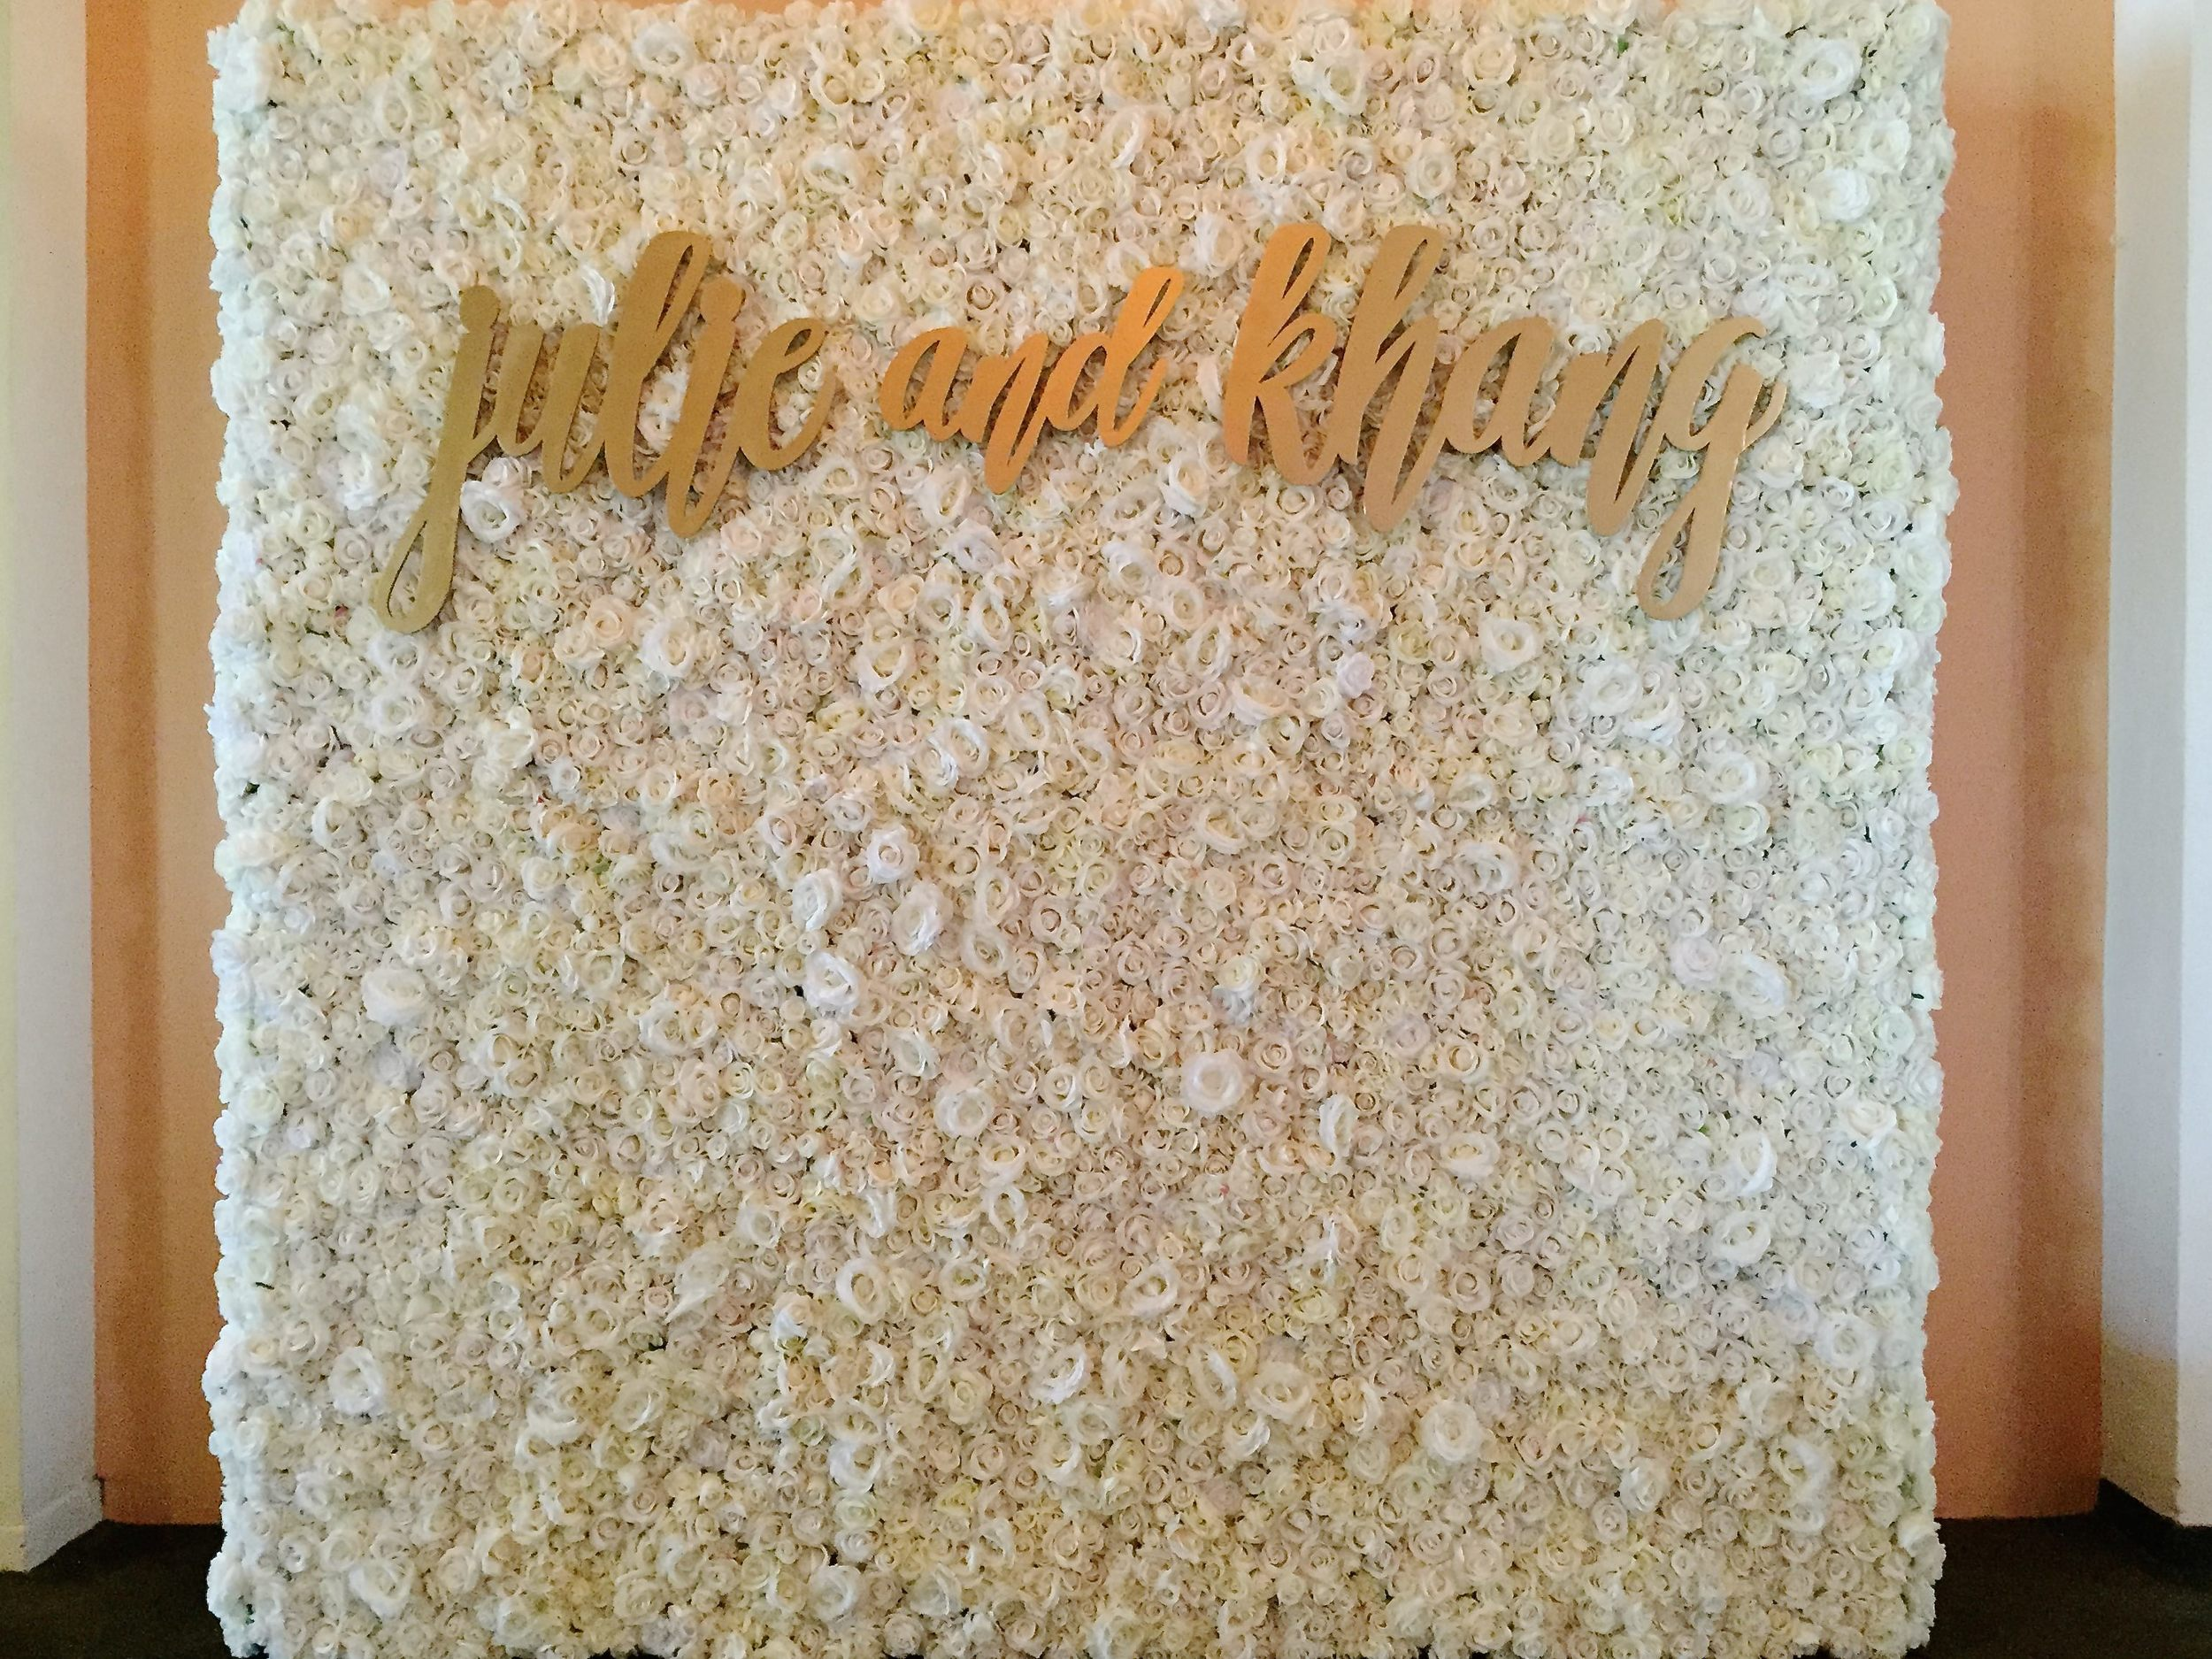 Curate-Julie-Khang-Rose-Wall-Full.JPG